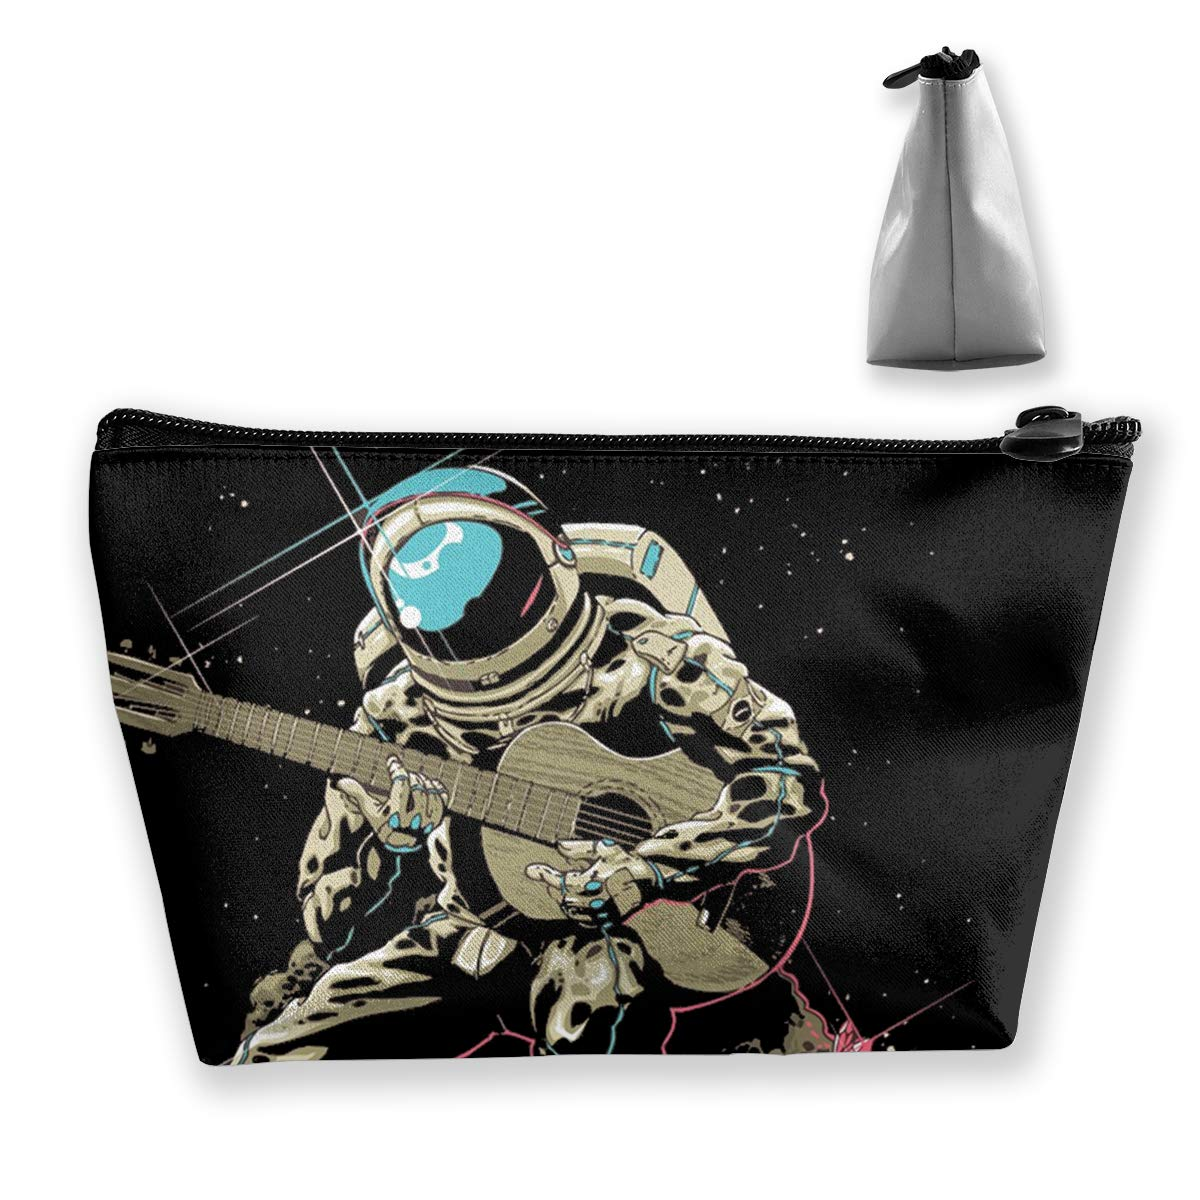 af58ec2eadfa Amazon.com: customgogo Women's Sushi Travel Makeup Bags, Portable ...